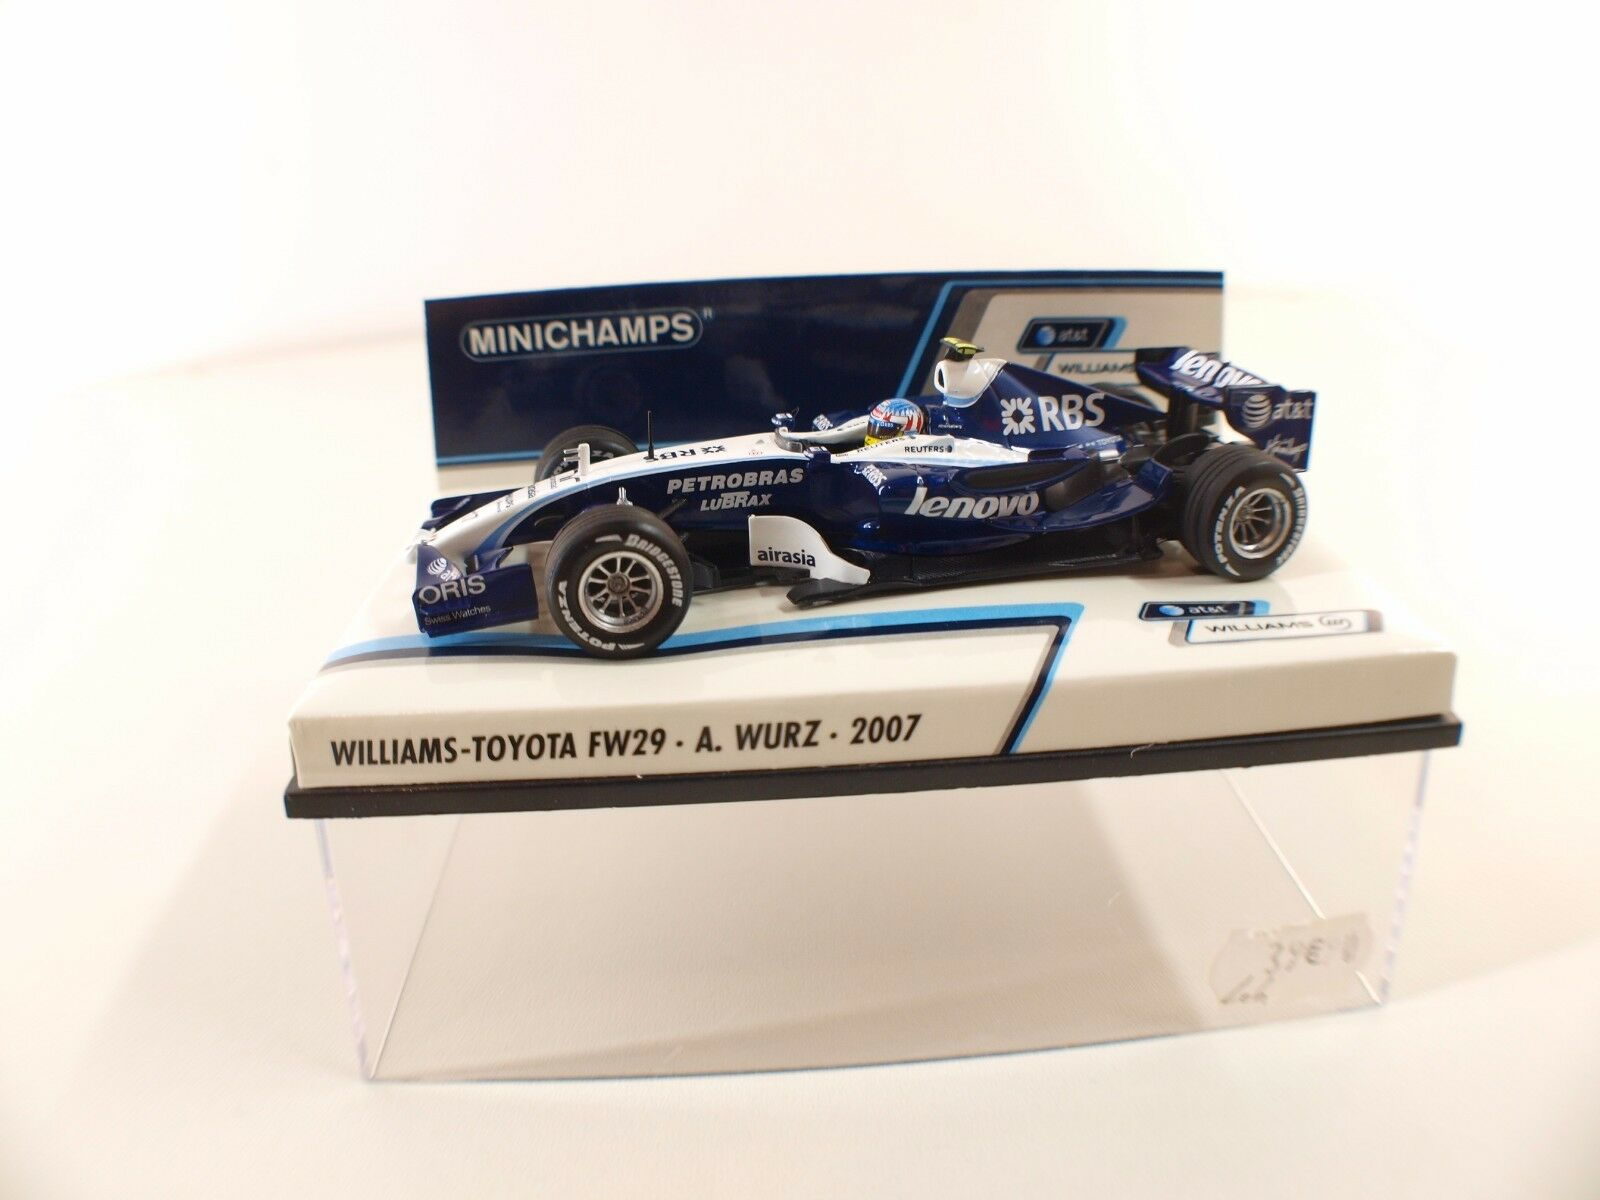 Minichamps Williams Toyota FW29 FW29 FW29 A.Wurz 2007 1/43 neuf boxed/en boite MIB | De Nouveaux Produits 2019  0cf2b3